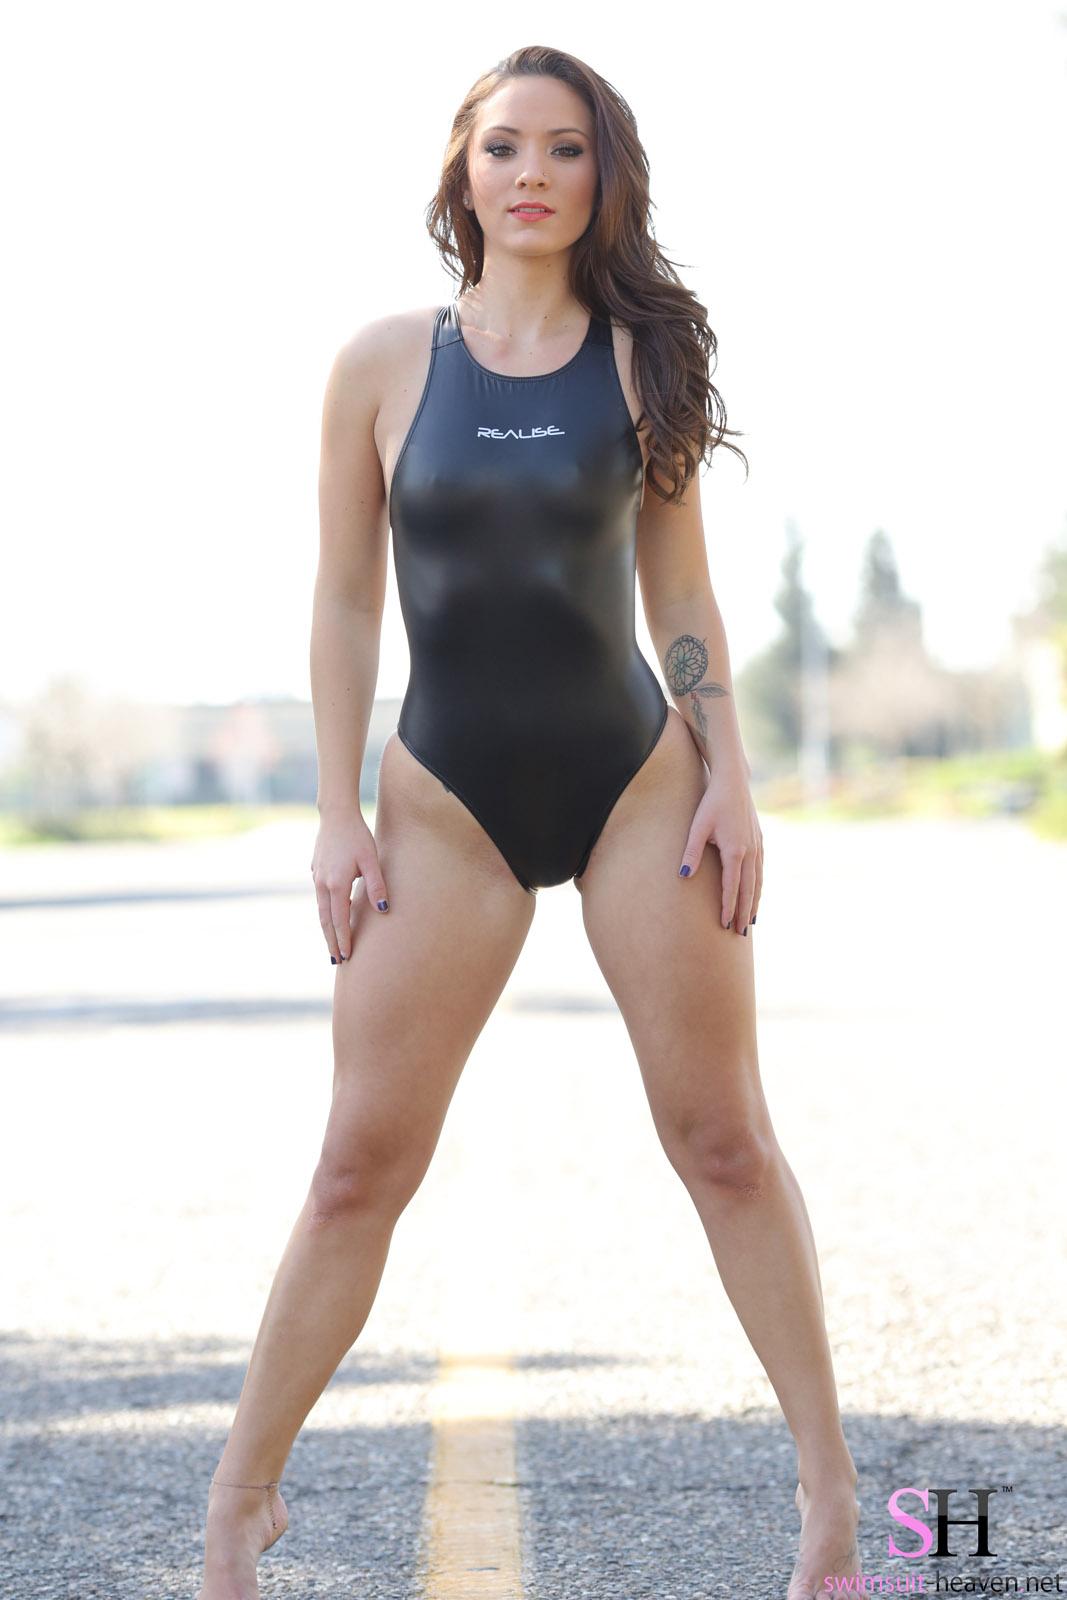 naked ass spreading girls